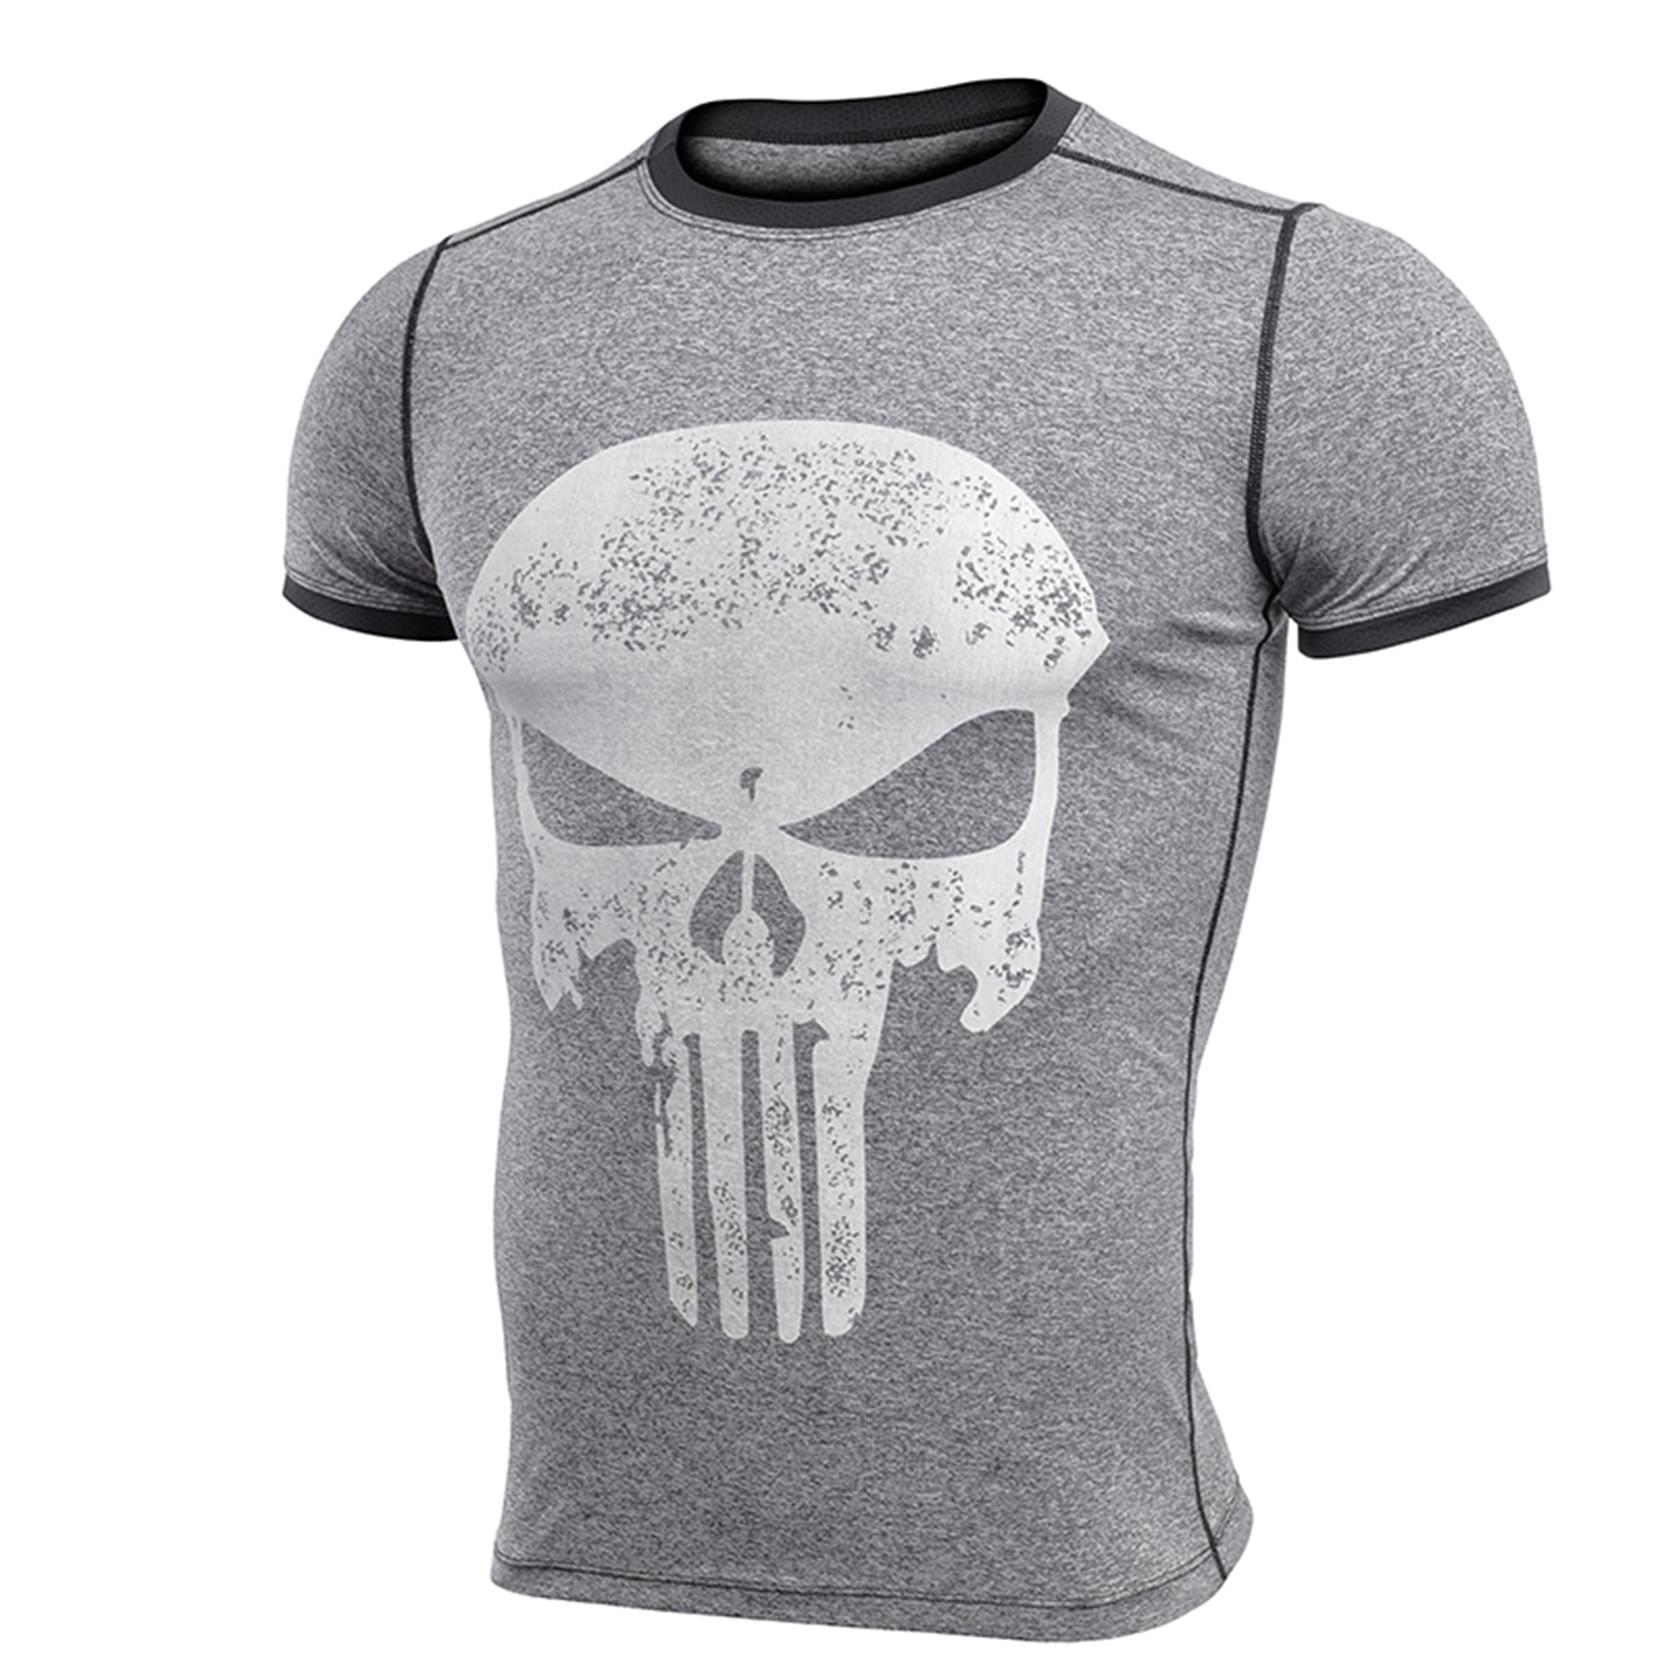 Fashion men quick dry t shirt summer casual 3d print skull for Quick t shirt printing